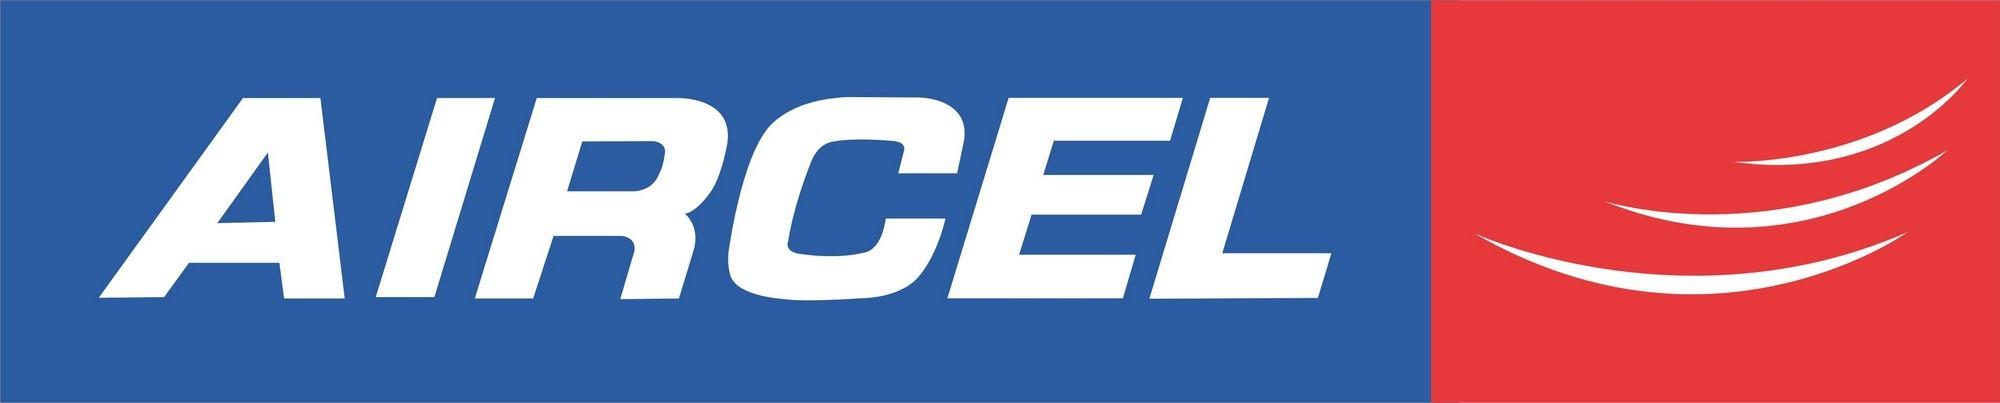 Aircel Logo [PDF] png